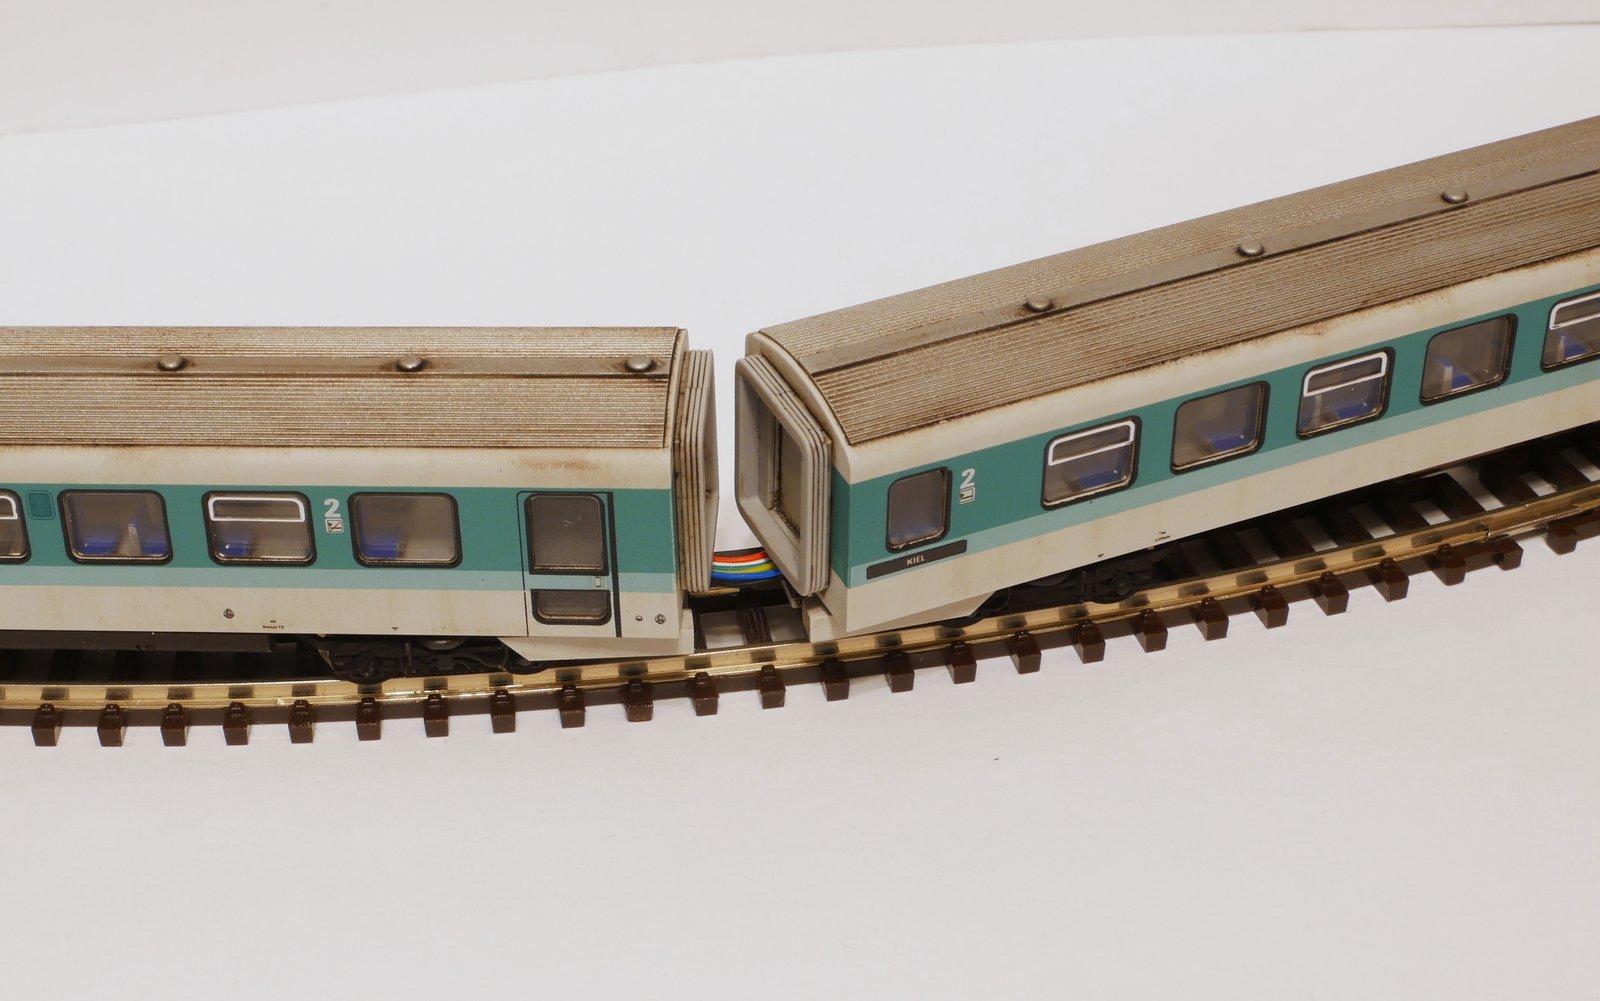 P1140778-001.JPG